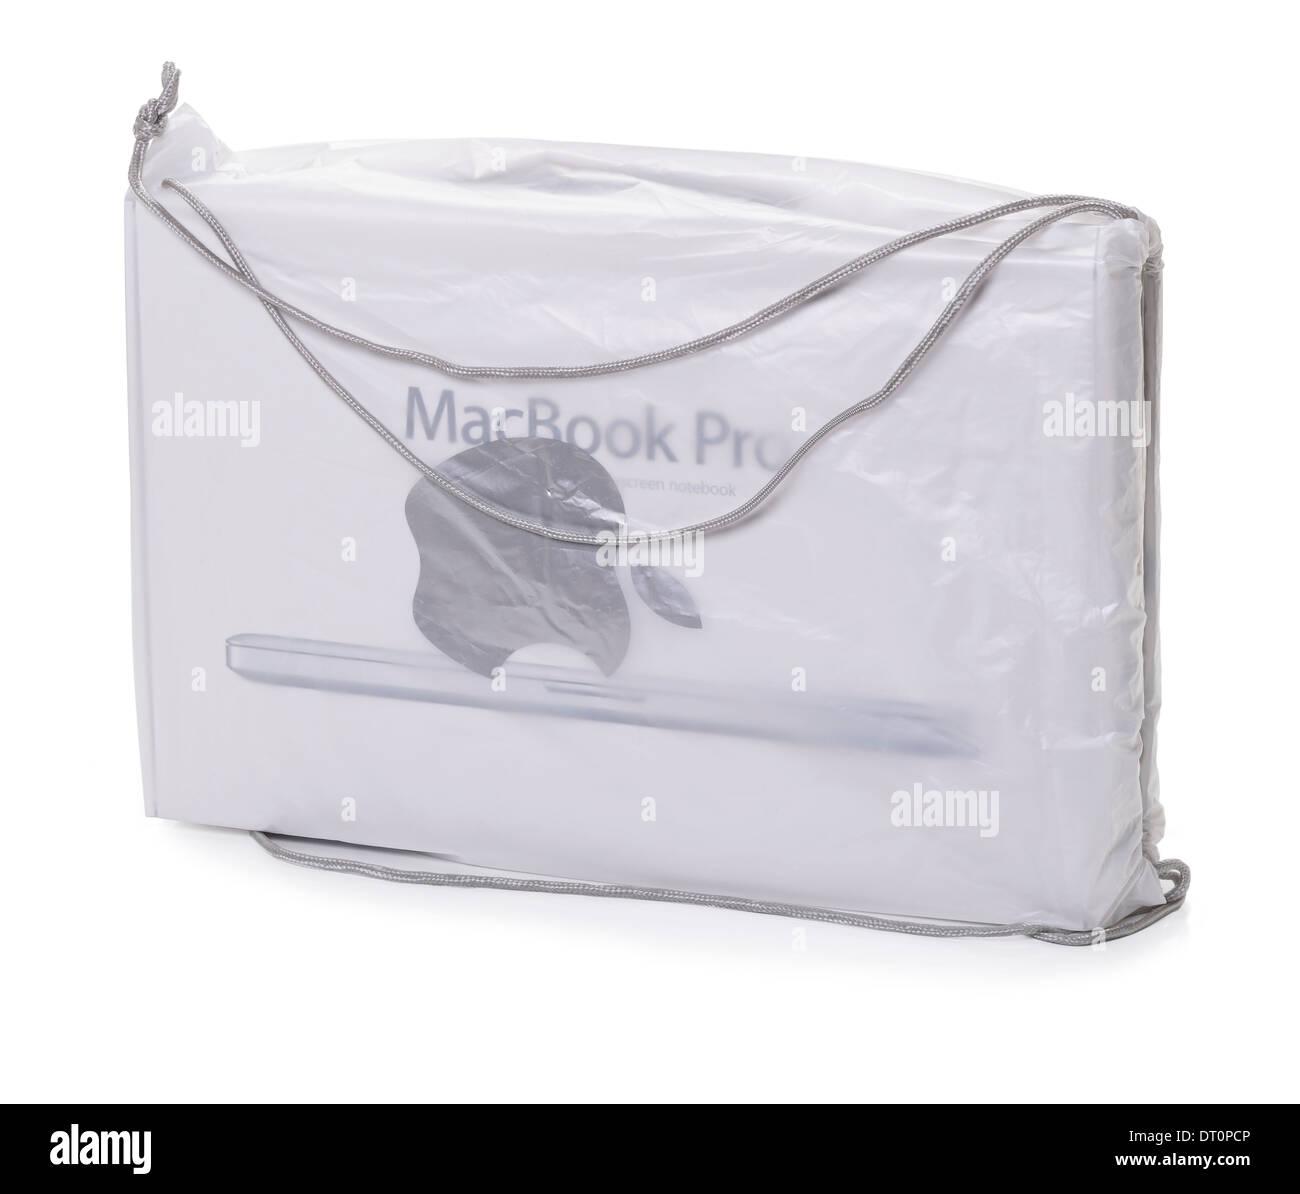 An Apple MacBook Pro laptop inside a retail carrier bag - Stock Image